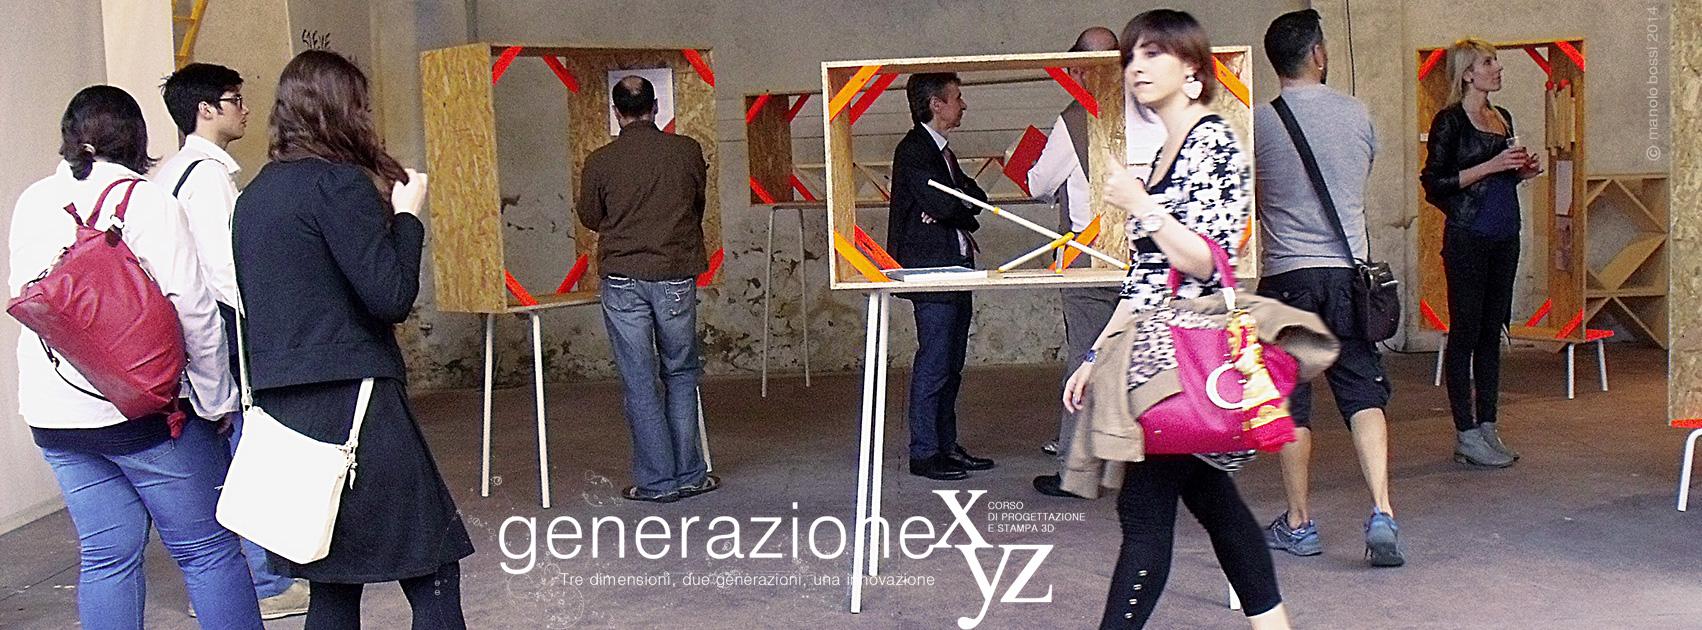 Generazione XyZ - Mostra - inaugurazione